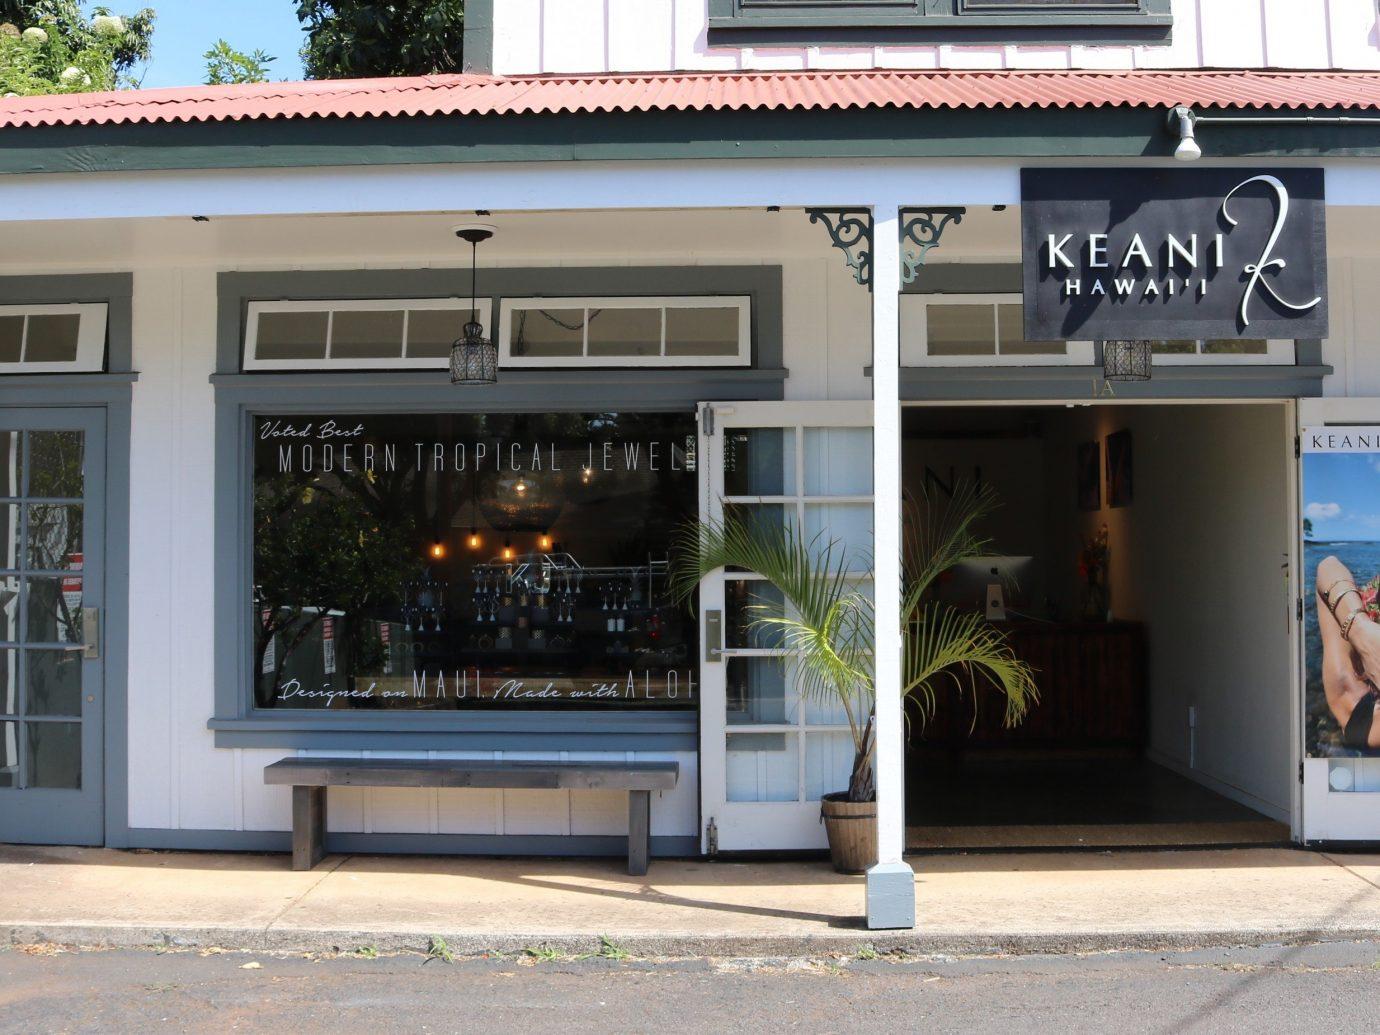 Trip Ideas building outdoor facade window retail café